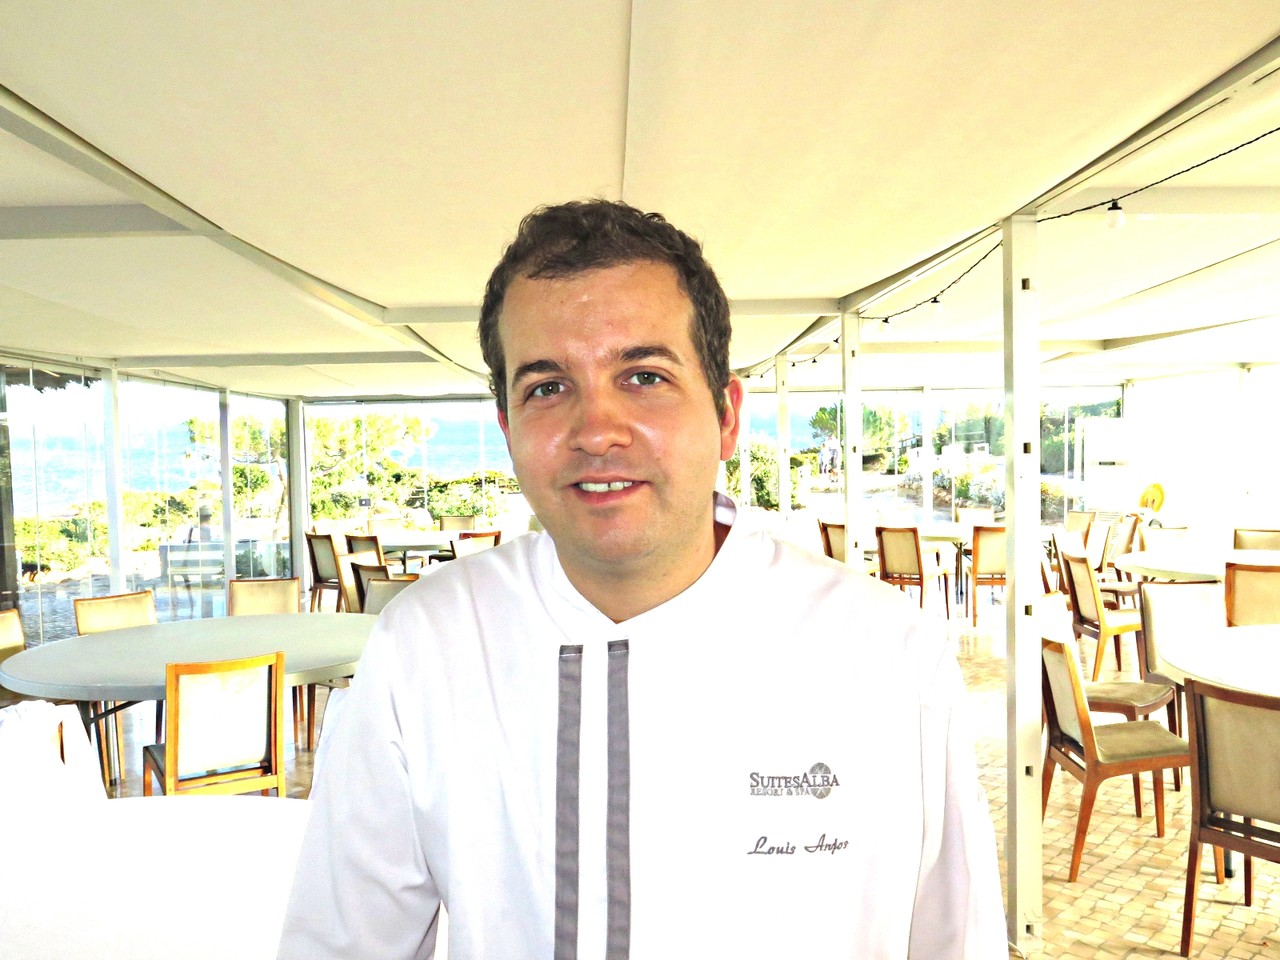 Louis Anjos